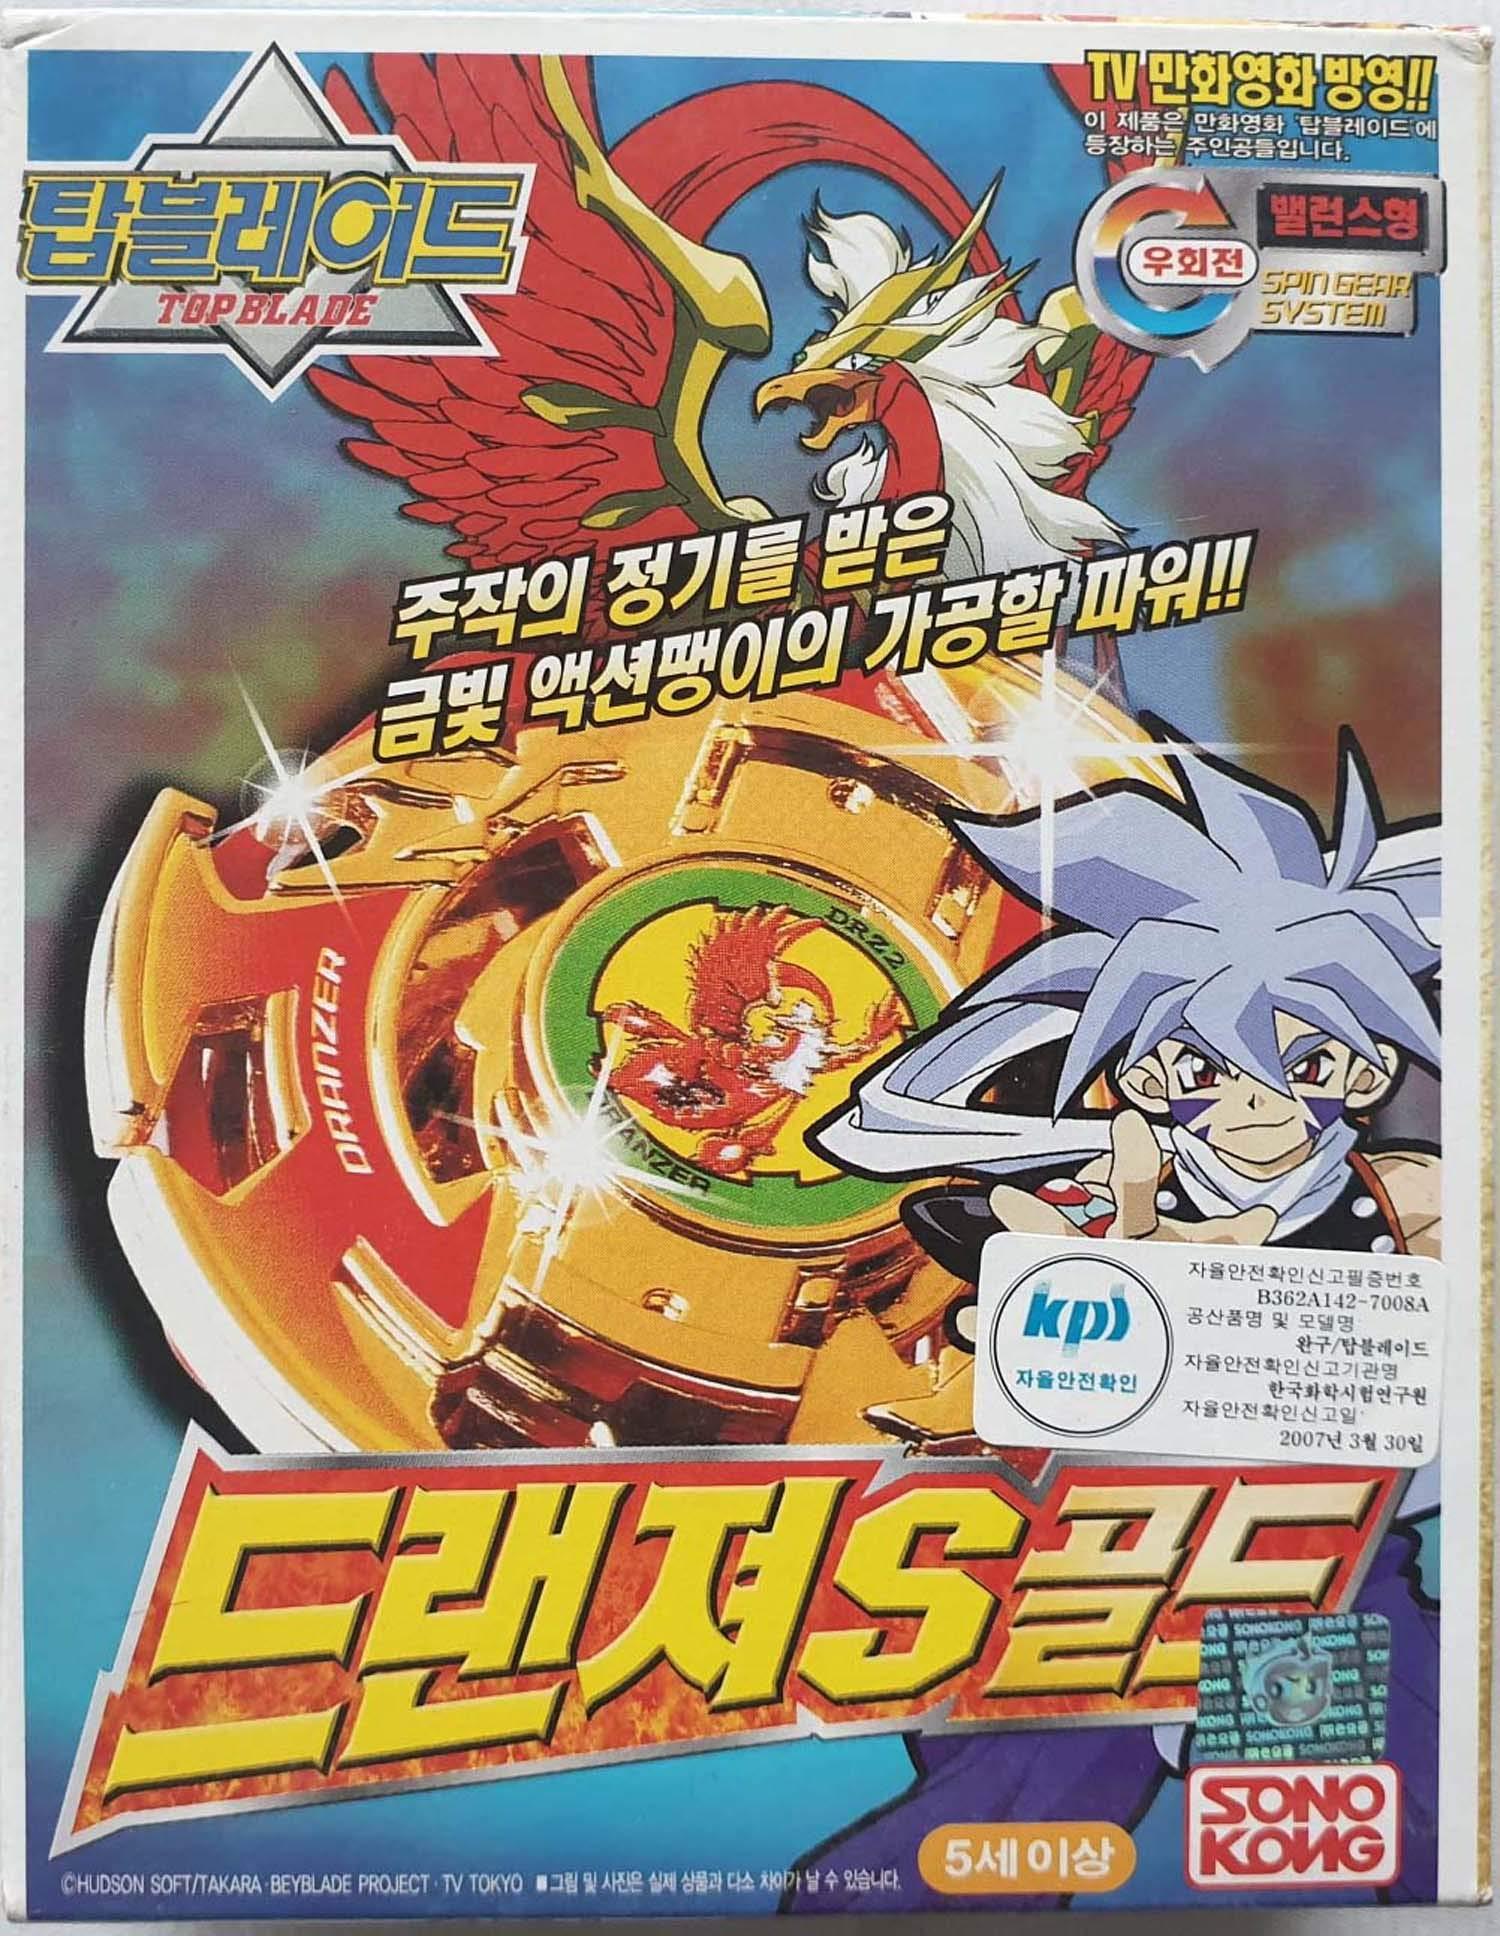 sonokong Takara Beyblade Topblade - Dranzer S Gold